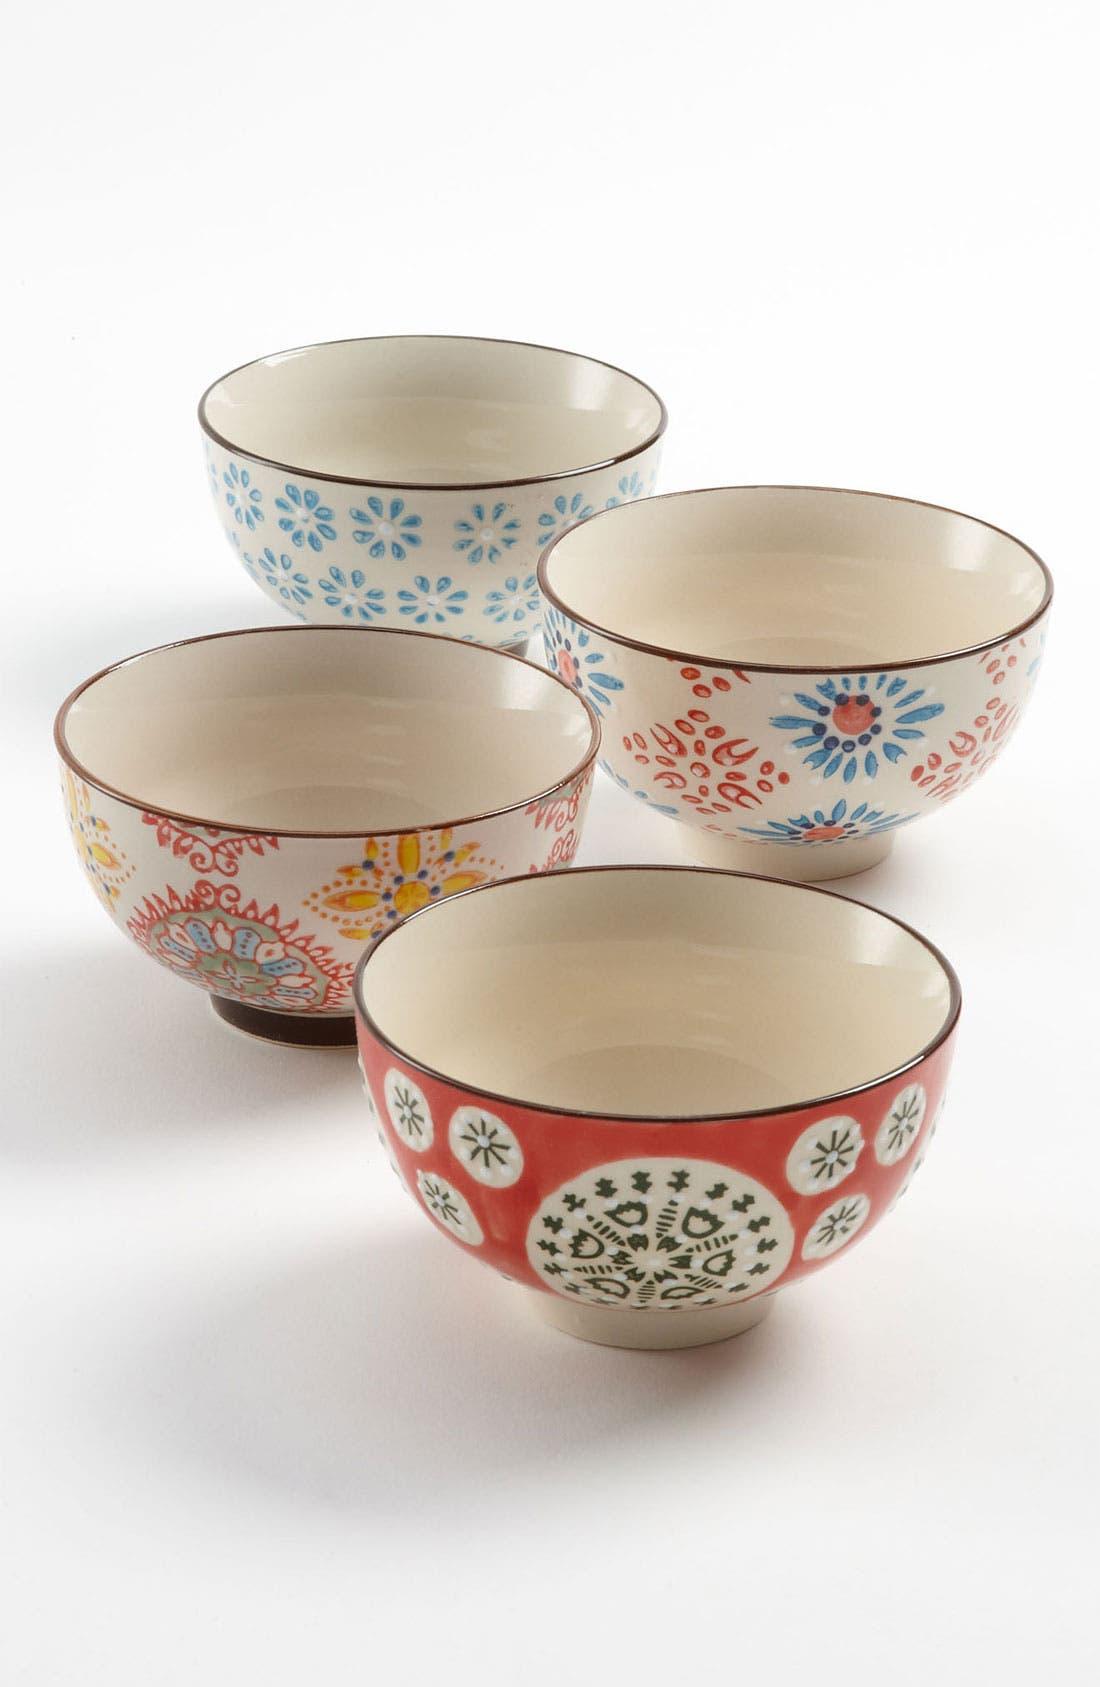 Main Image - Chehoma Atelier d'Ambiances 'Bohemian' Bowls (Set of 4)